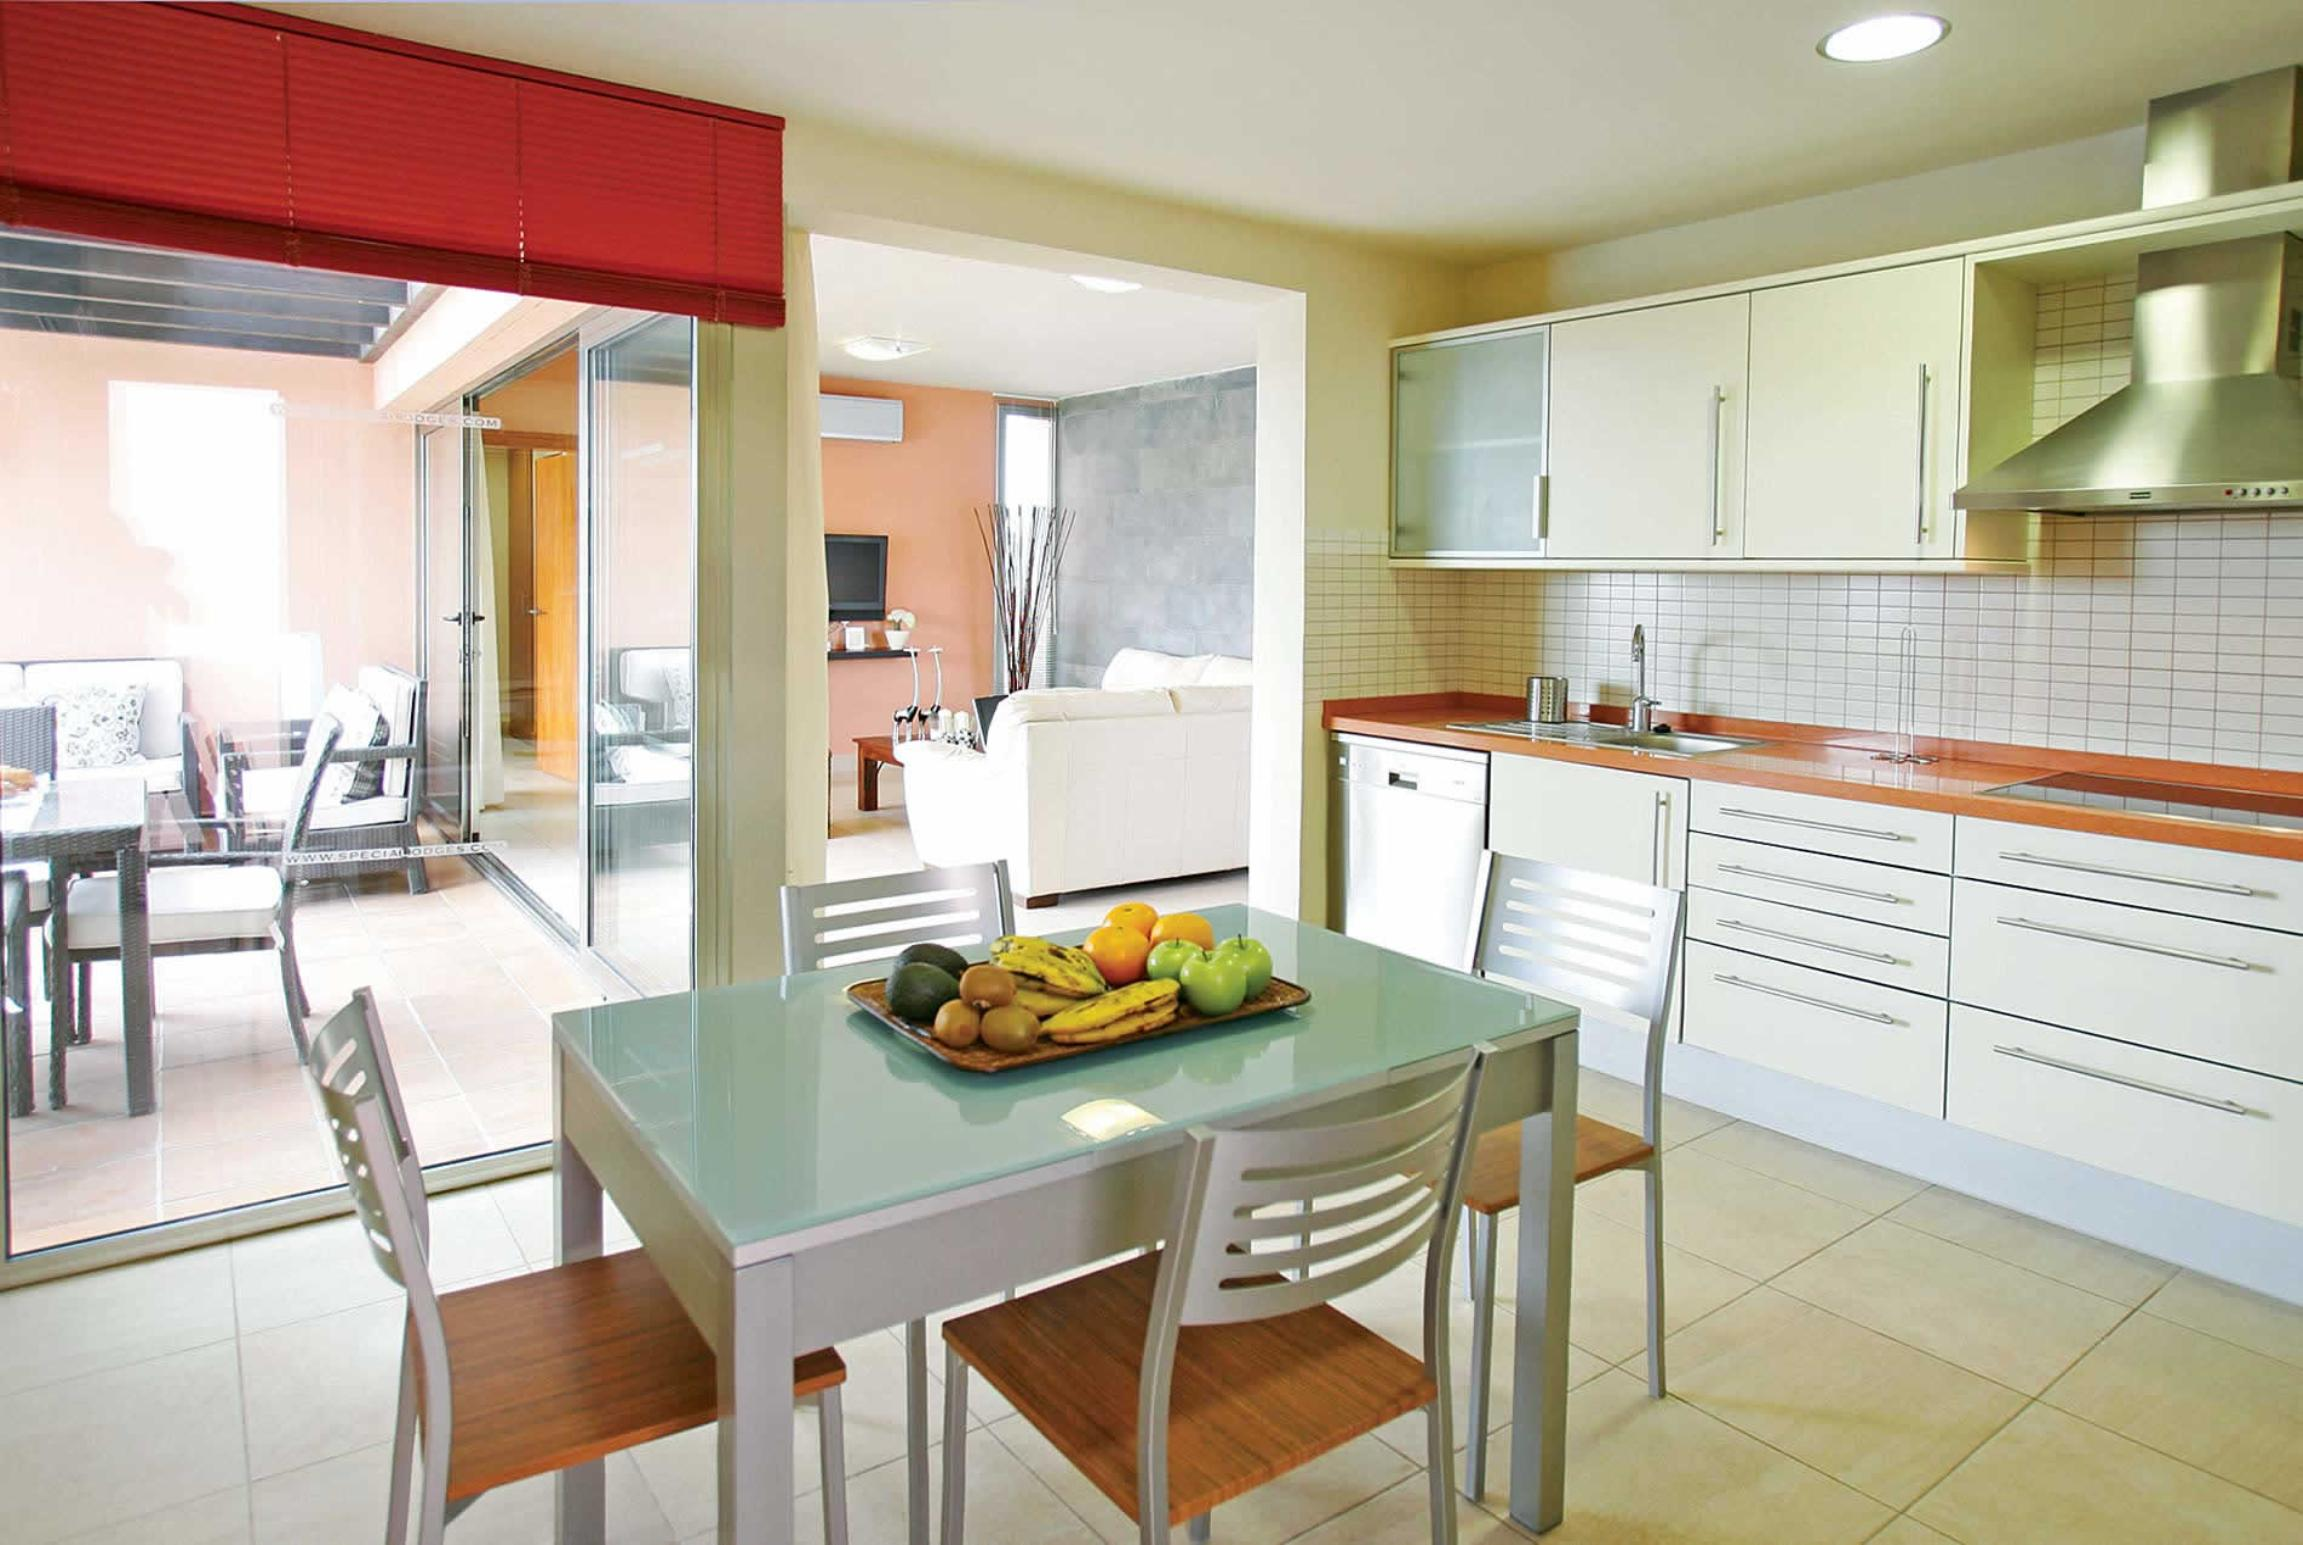 Holiday house Par 4 Villa 3 (2653981), Maspalomas, Gran Canaria, Canary Islands, Spain, picture 5